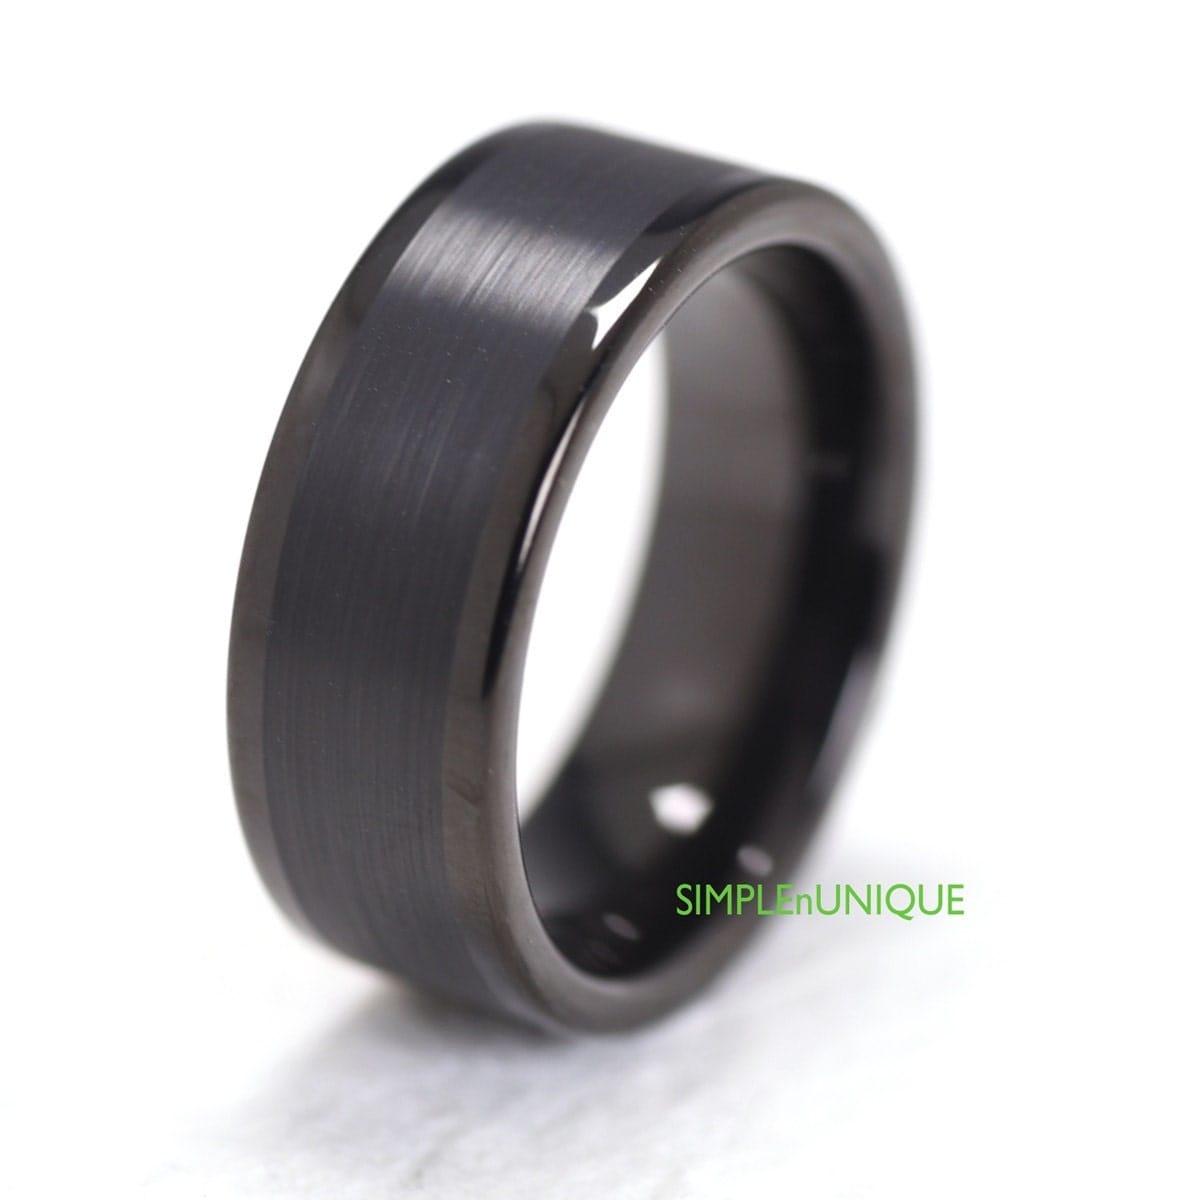 Unique Men S Wedding Bands: Mens Wedding Band Ring Unique Black Tungsten By SIMPLEnUNIQUE